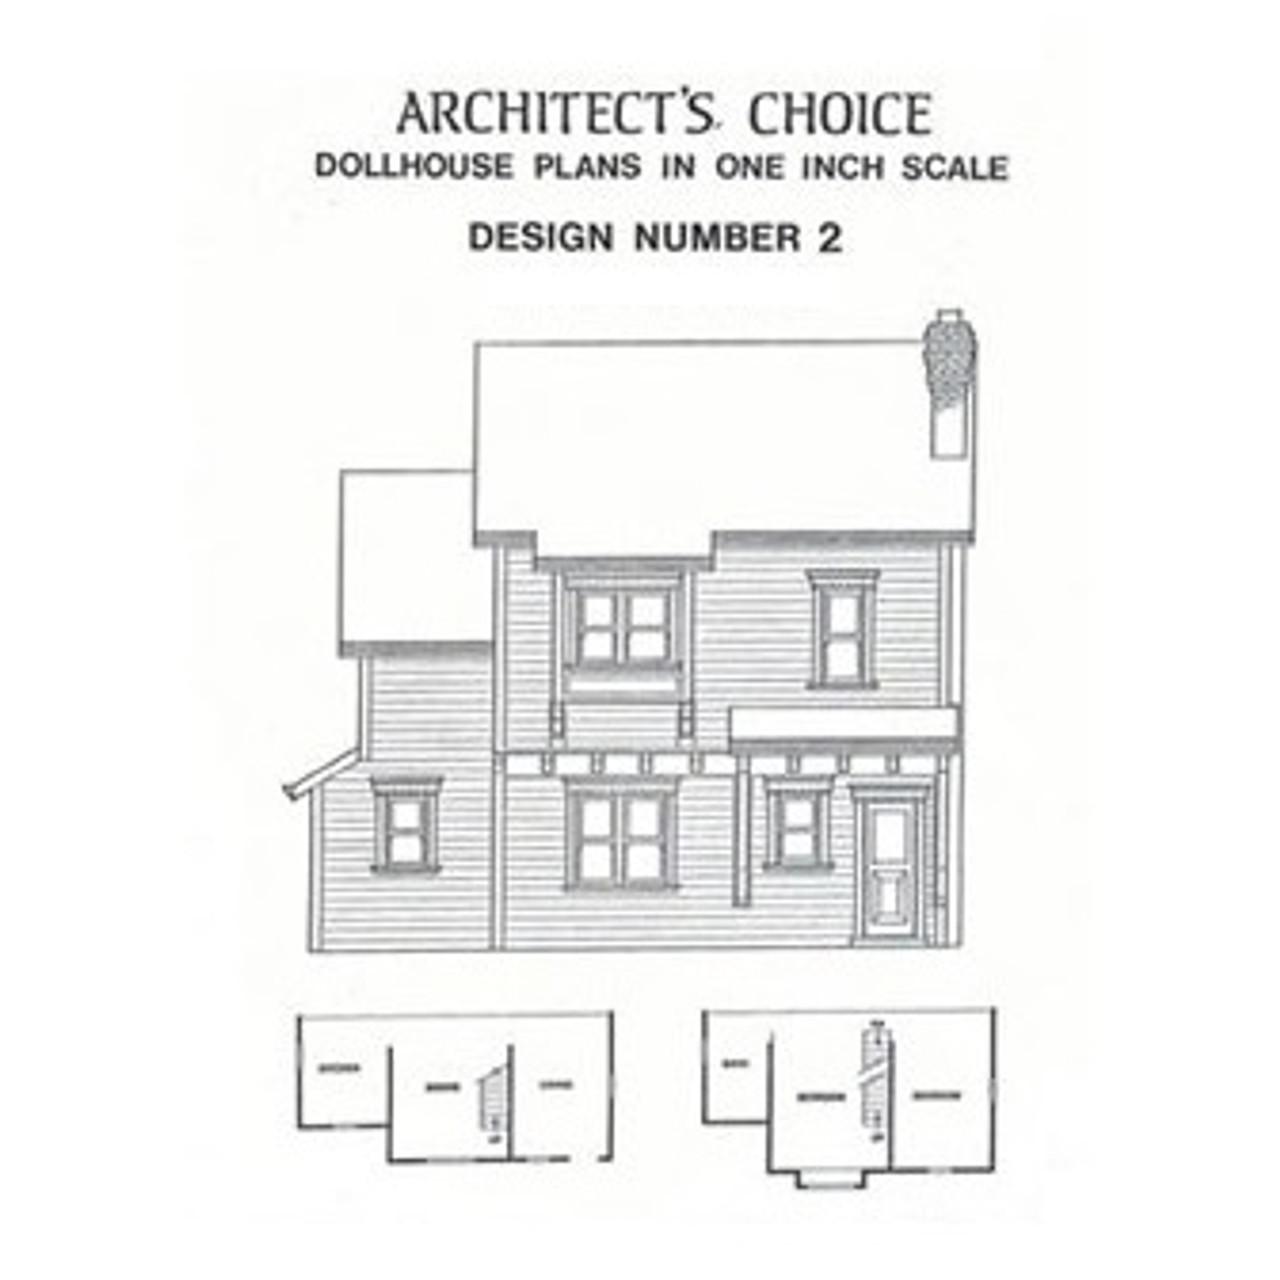 Dollhouse Plan #2